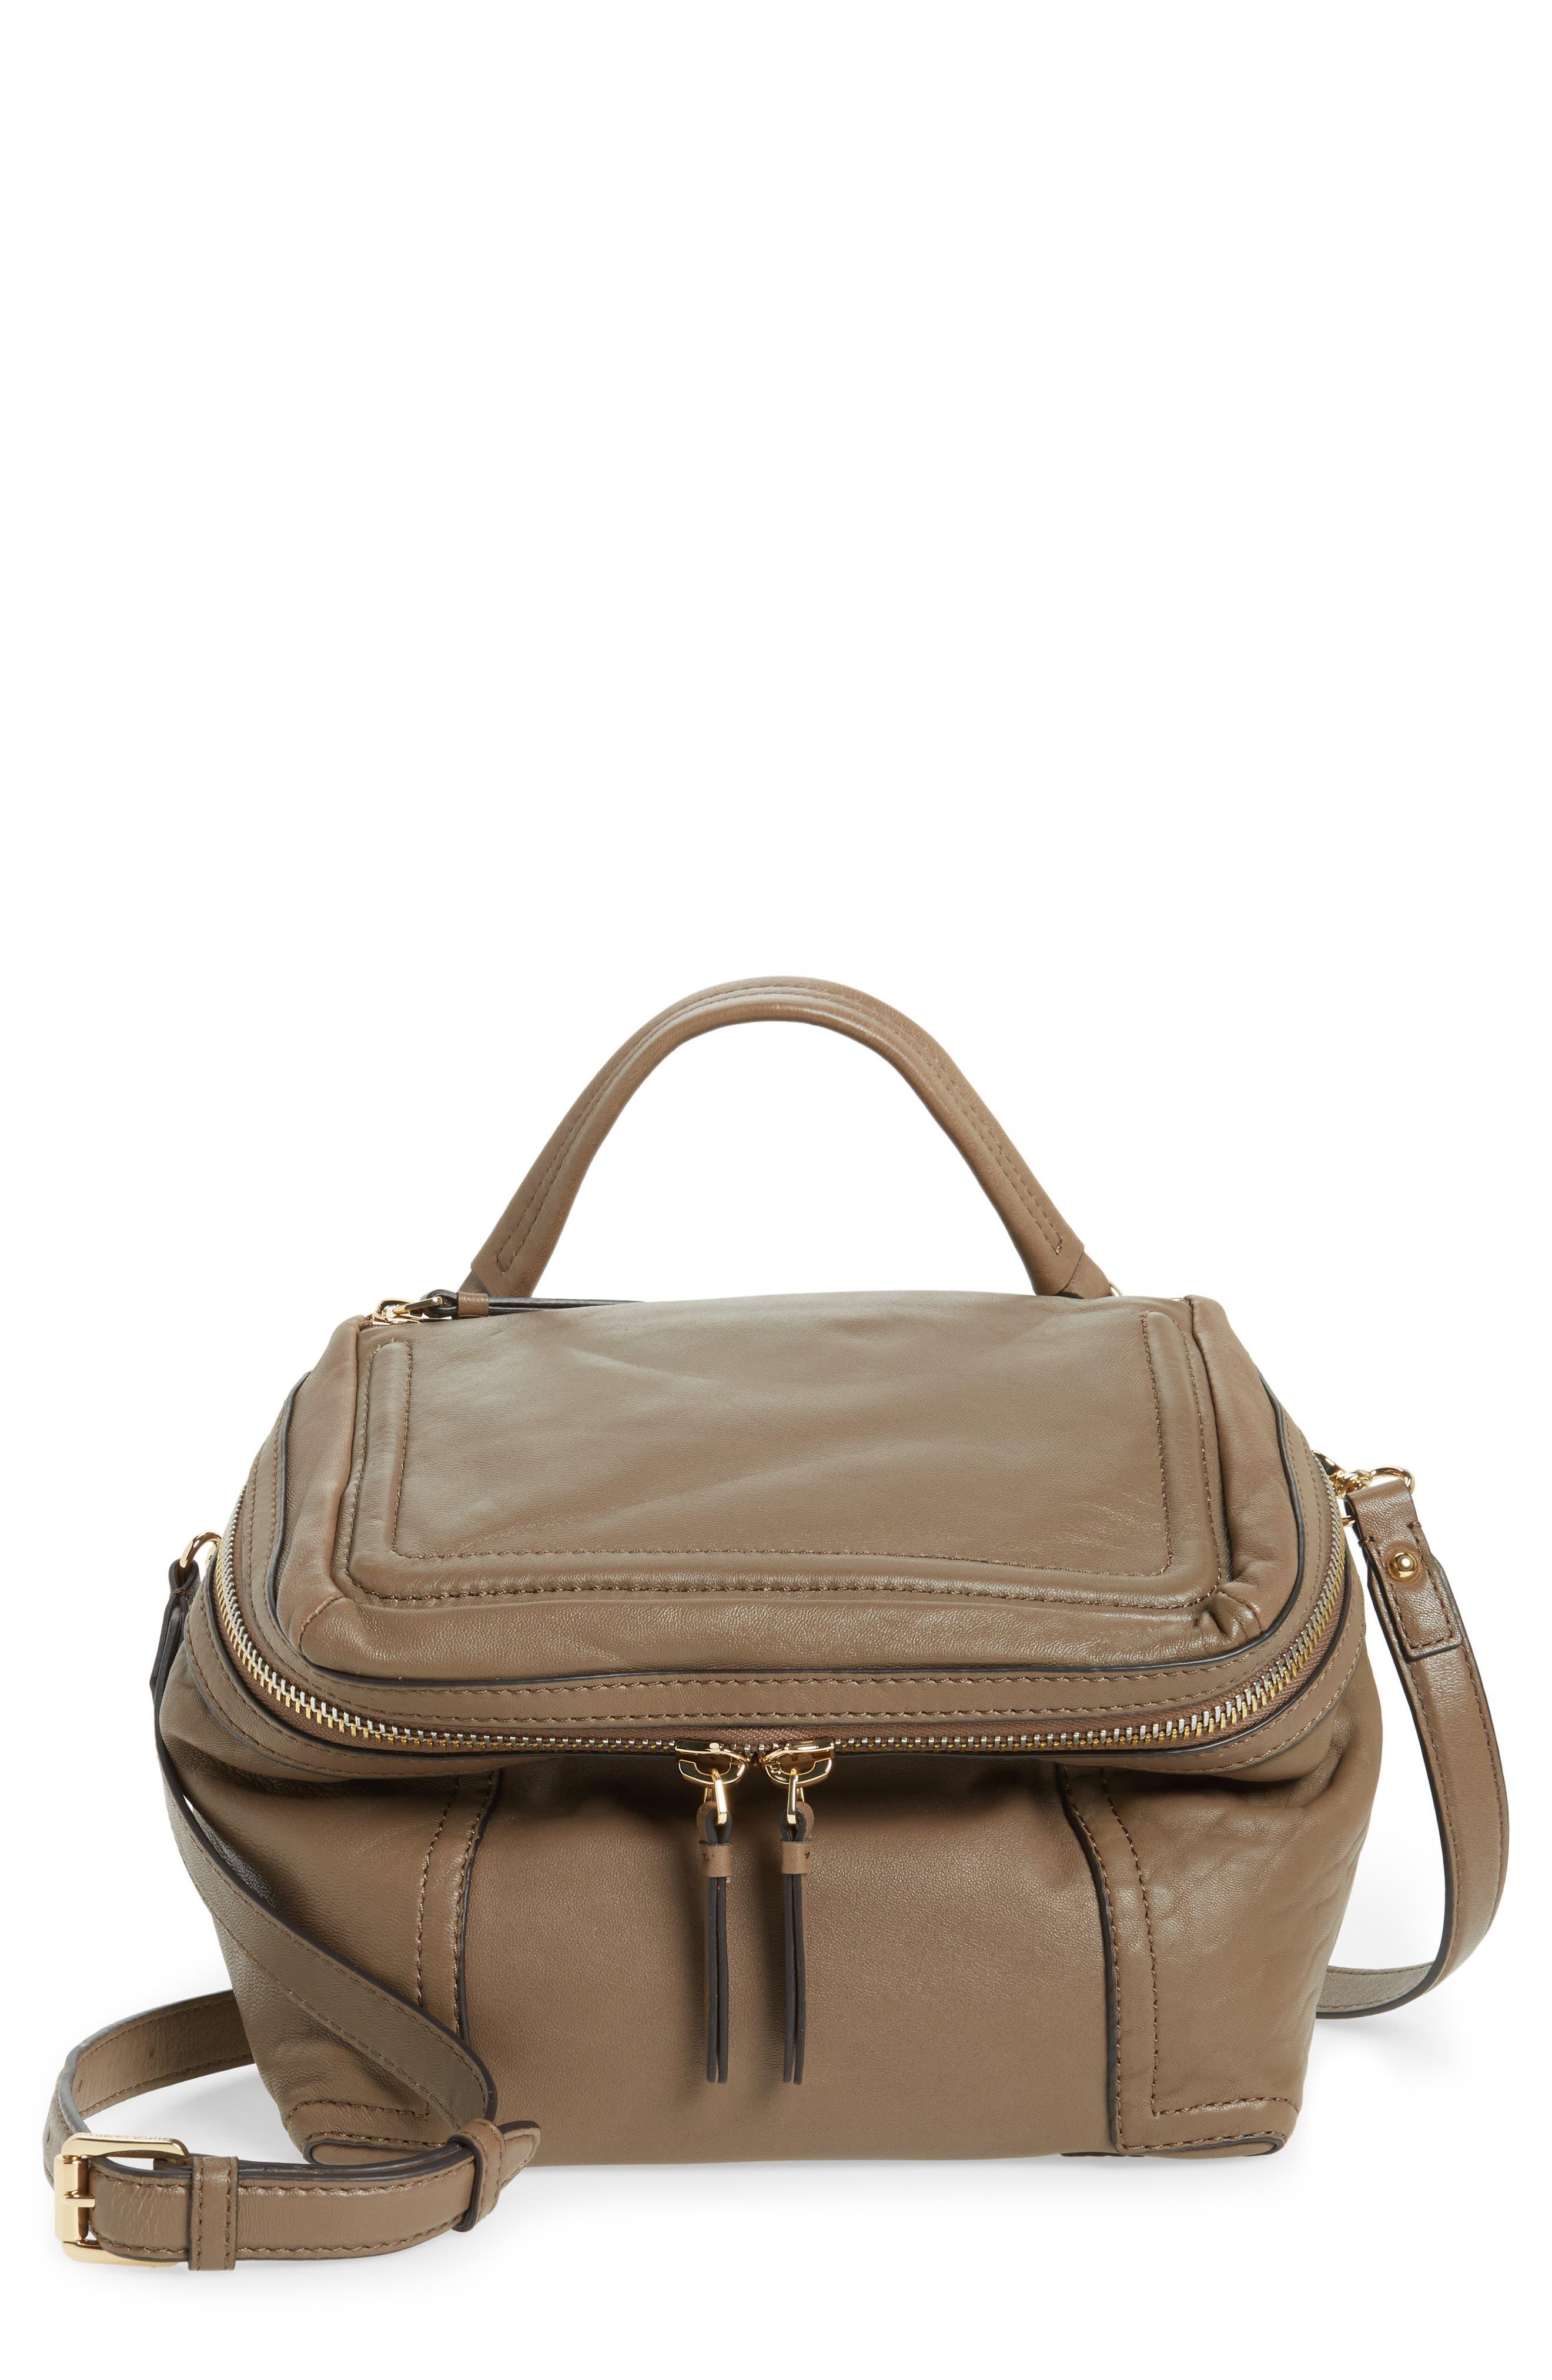 Main Image - Vince Camuto Medium Patch Leather Crossbody Bag